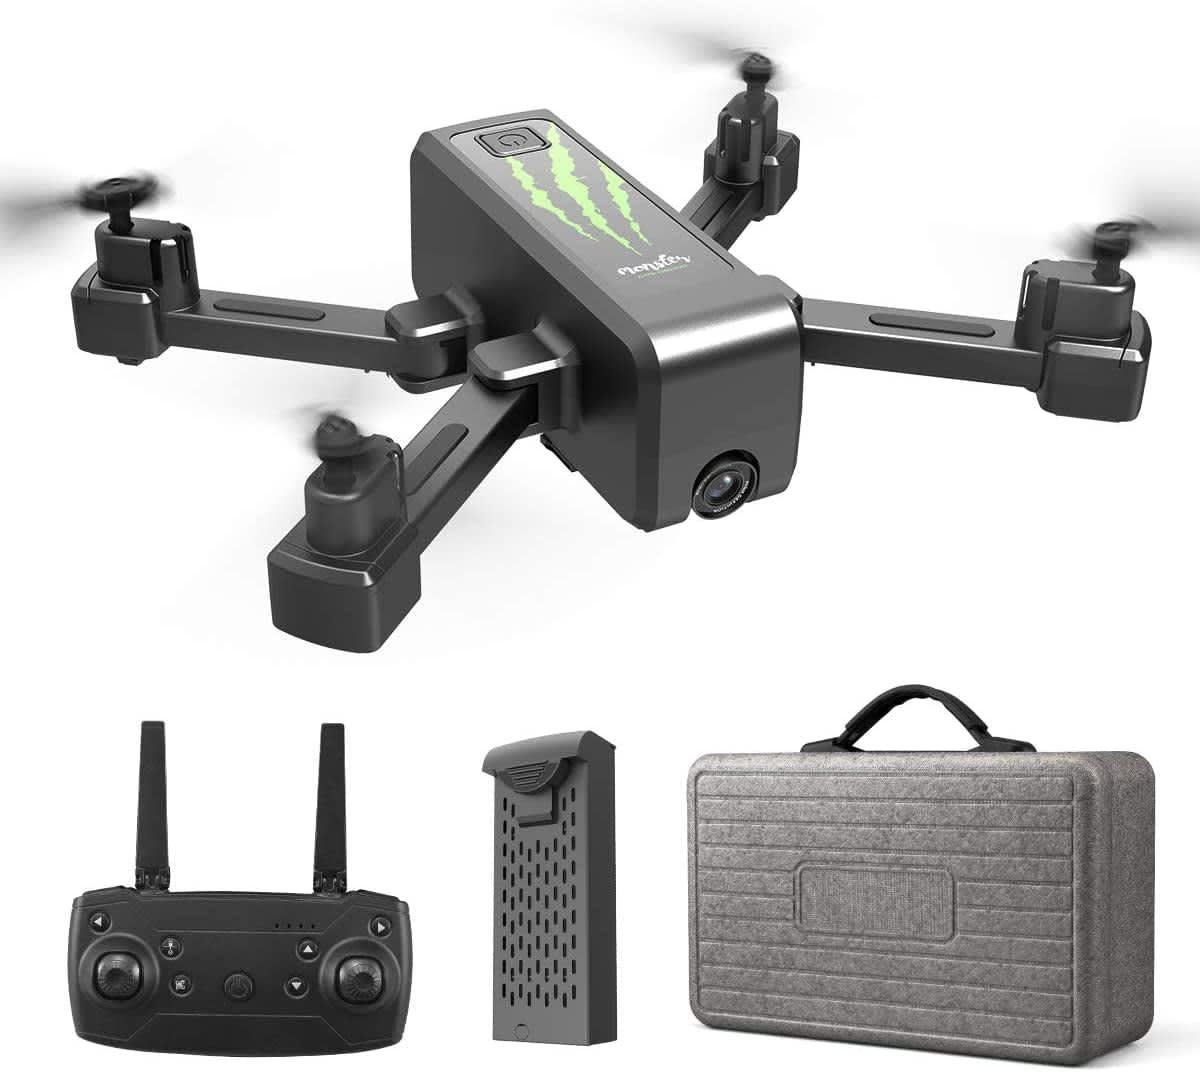 HR RC Foldable Quadcopter Camera Drone